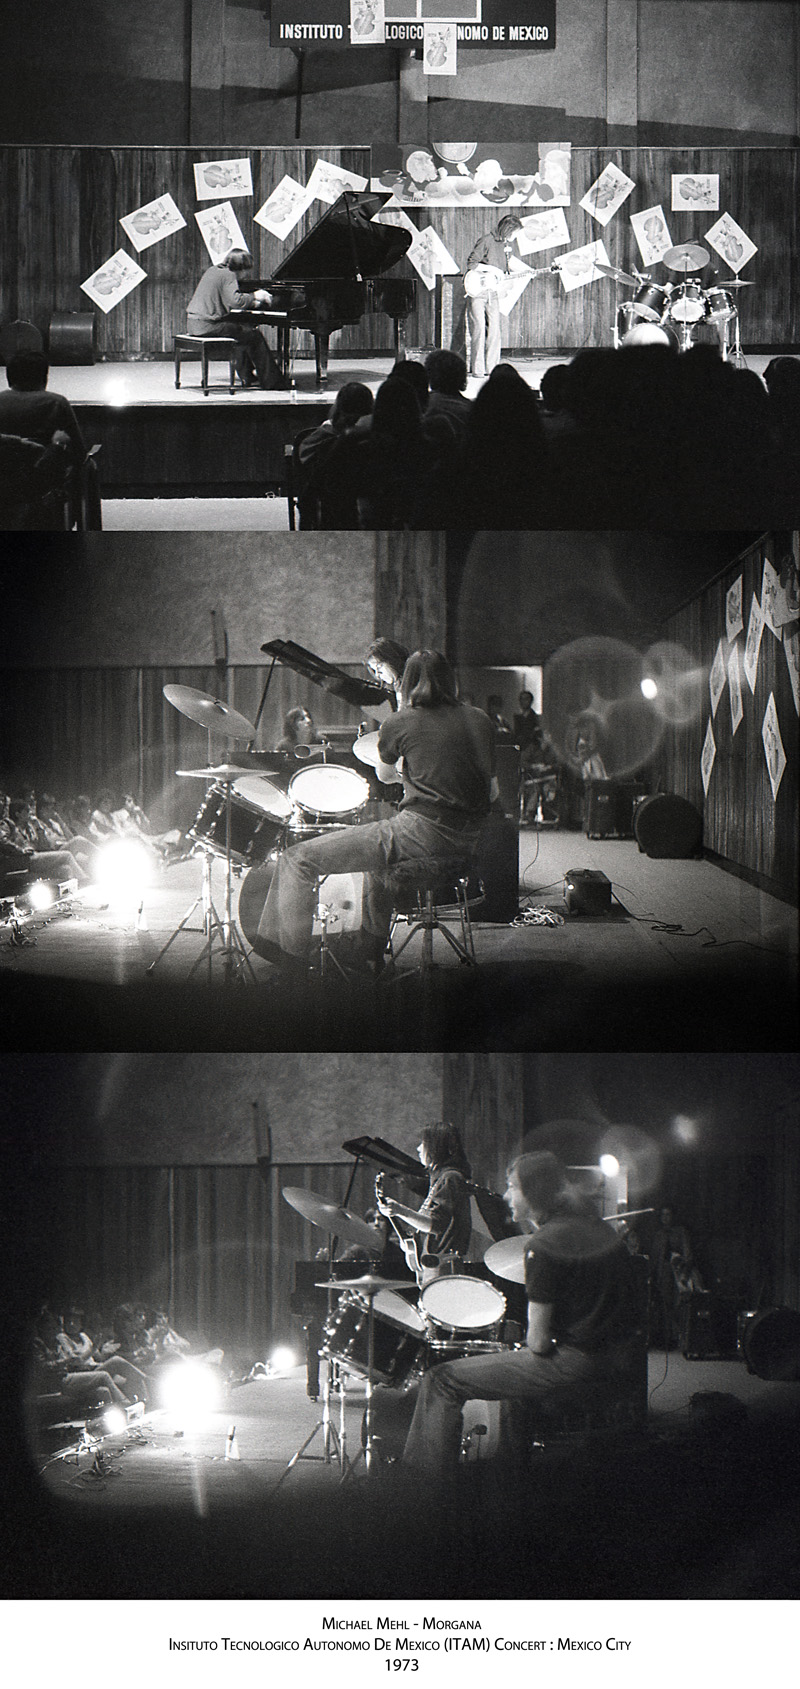 1973_Michael-Mehl_Morgana_Instituto-Tecnologico-Autonomo-De-Mexico-Concert_Mexico-City